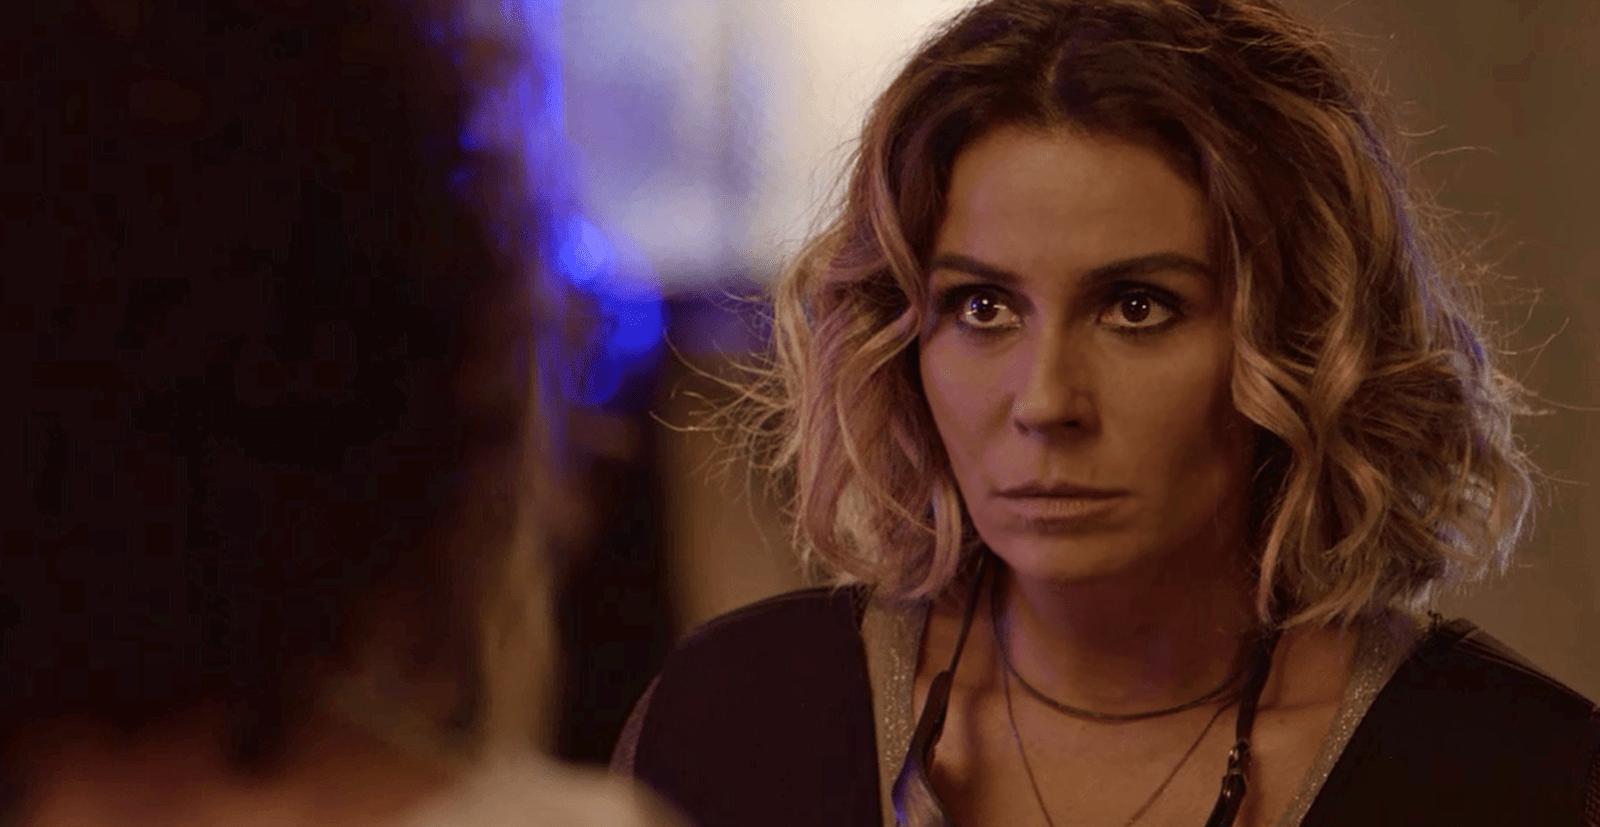 Segundo Sol: Luzia tenta impedir que Manuela seja assassinada